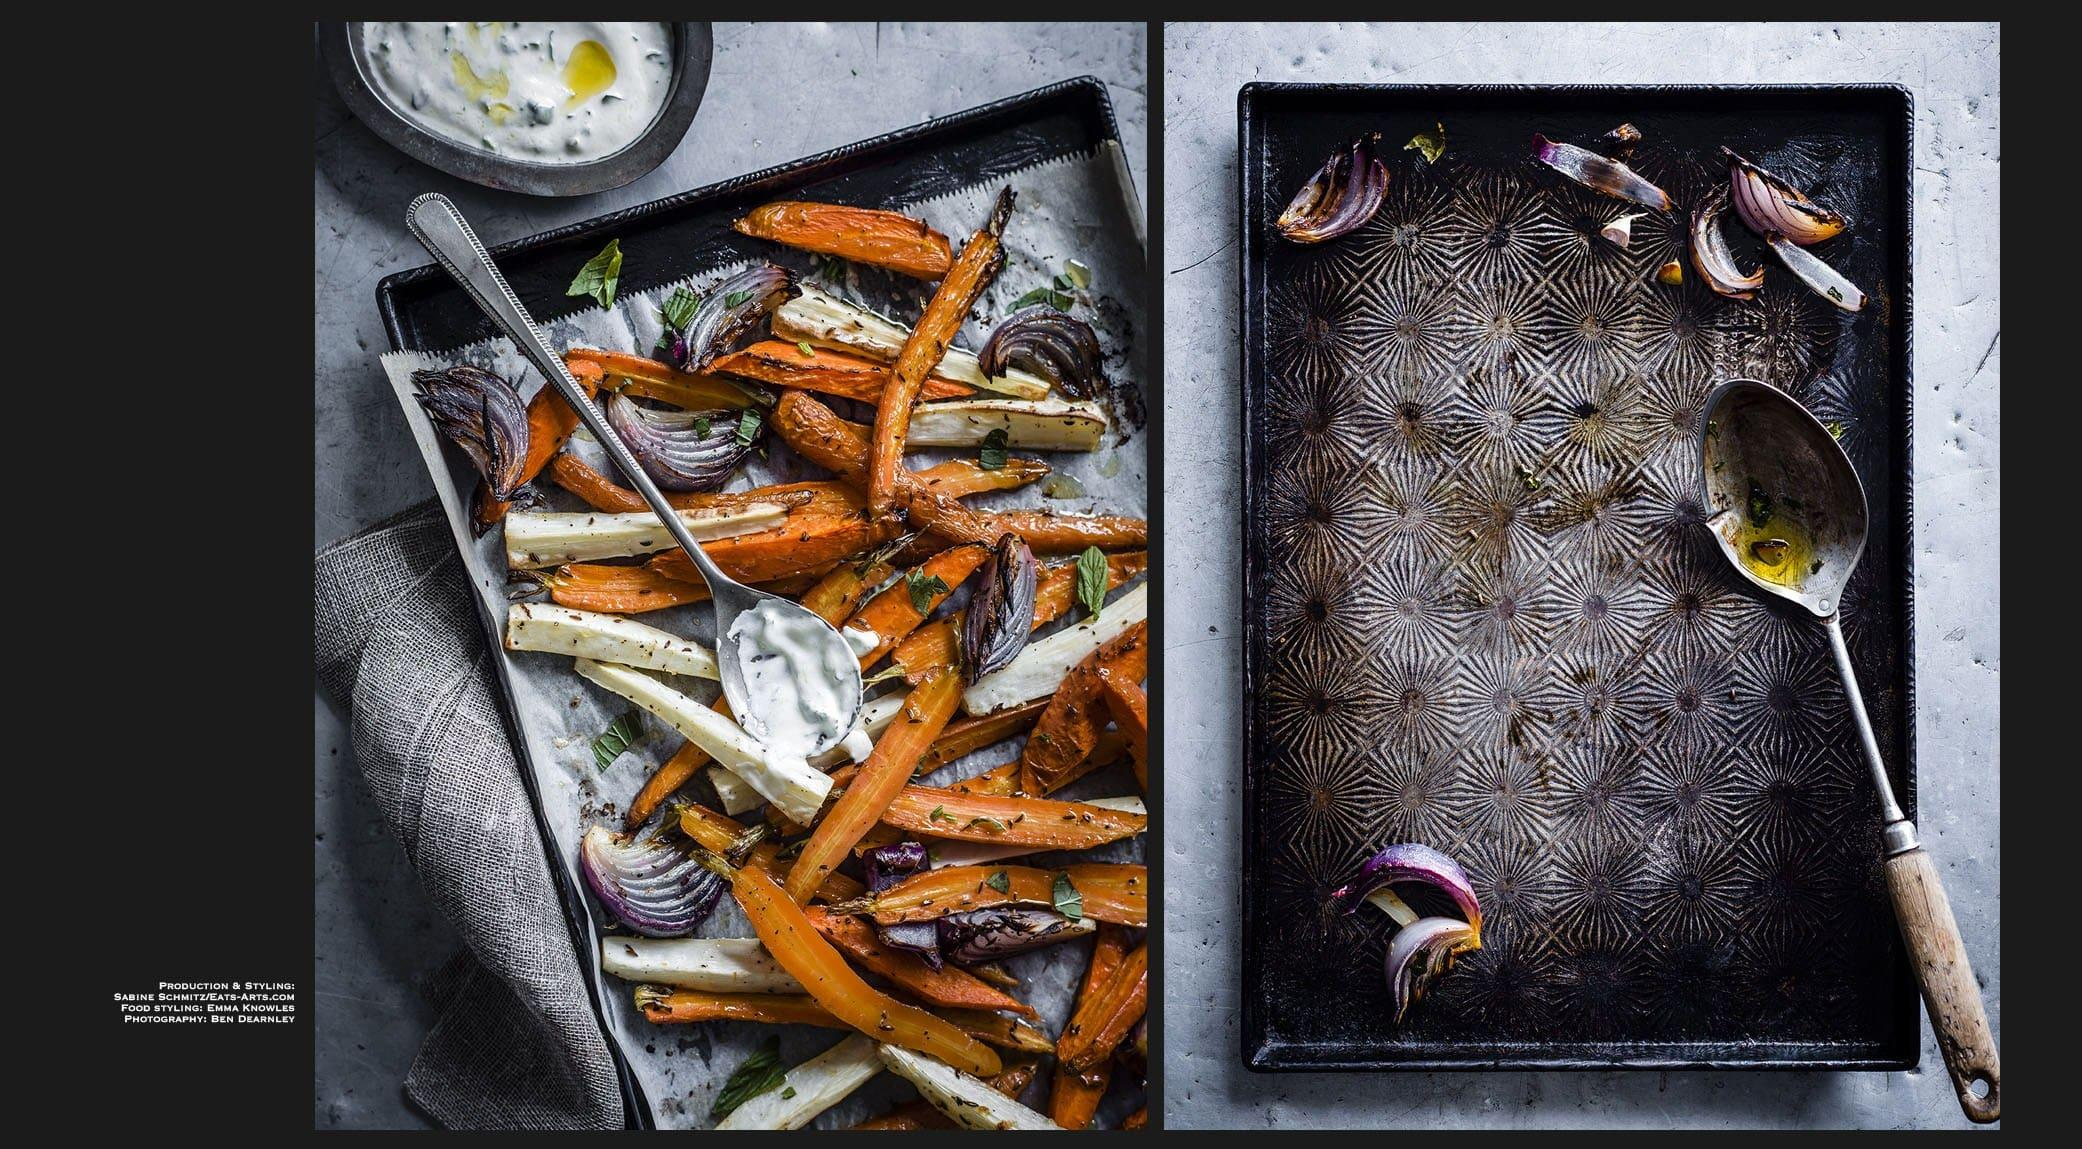 original_005-Vegetables-copyright-Eats-Arts-.jpg